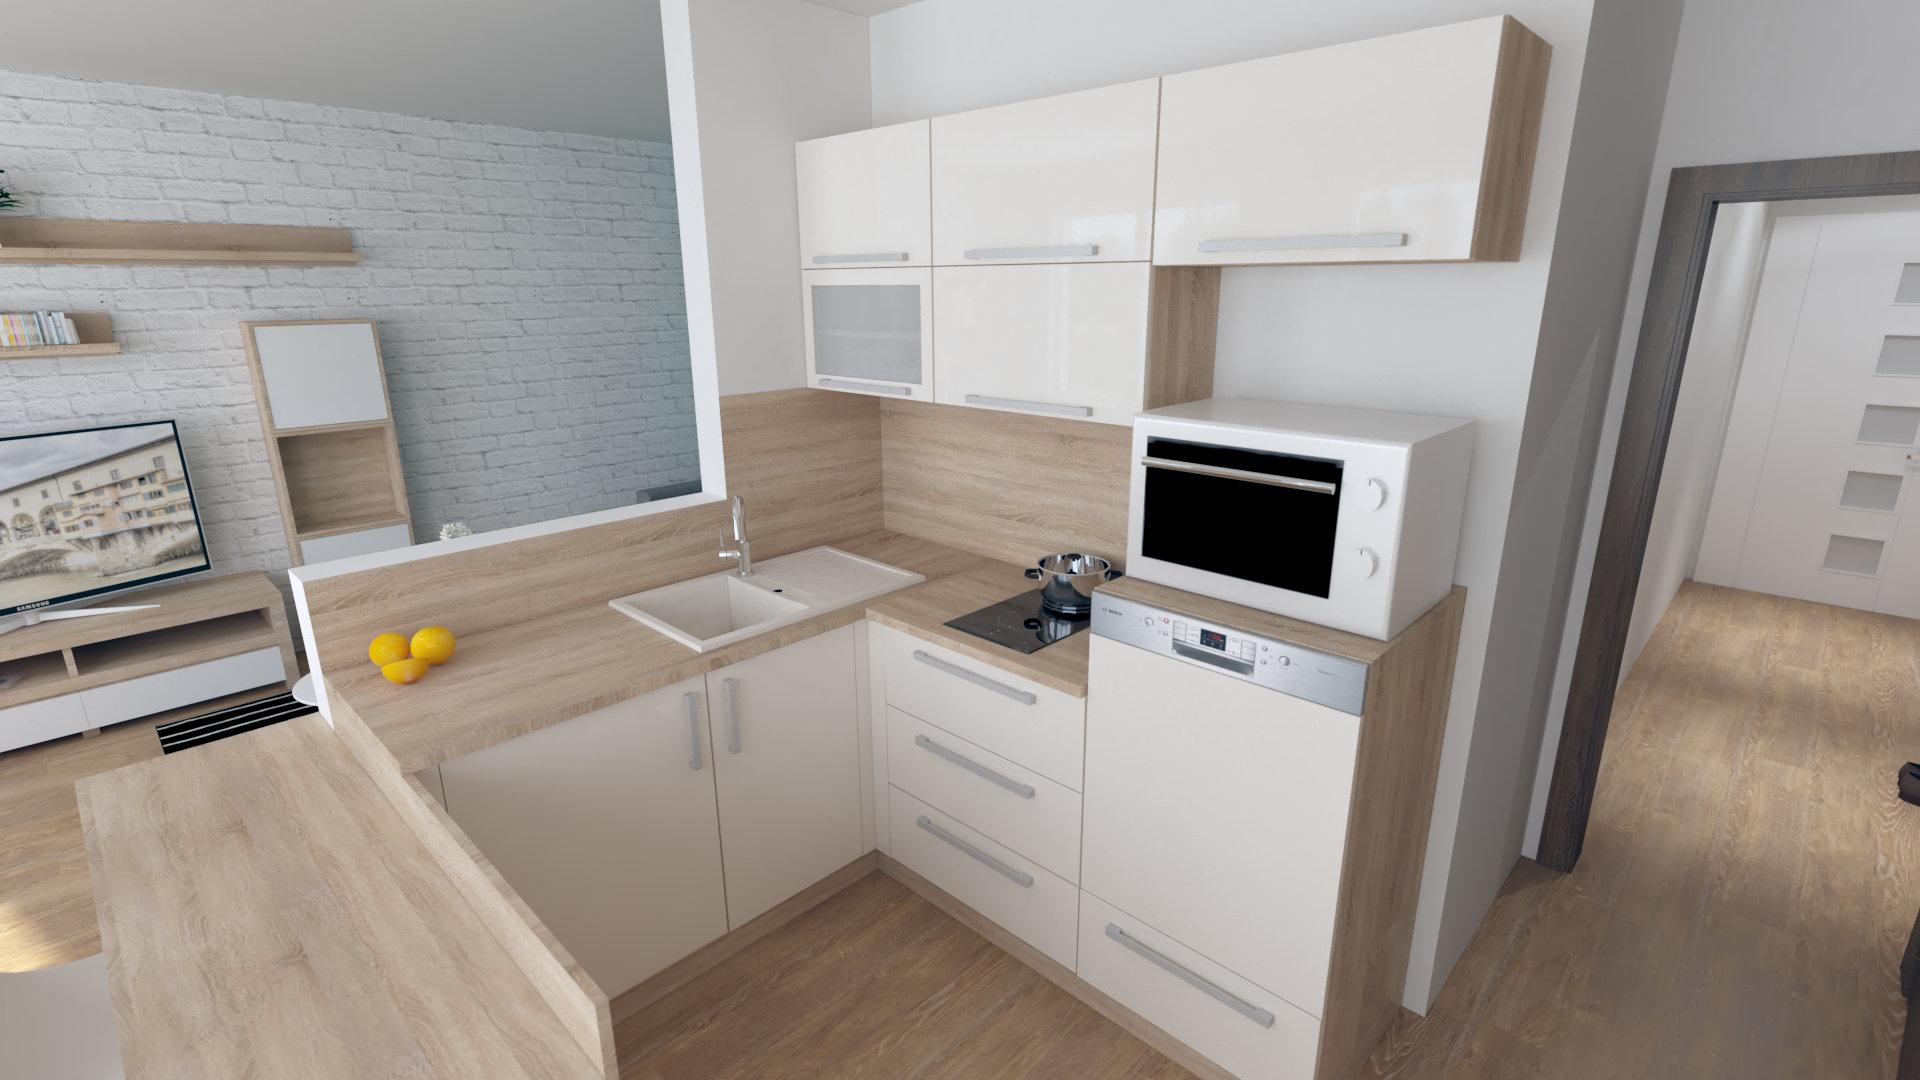 jednoizbovy byt navrh mala kuchyna